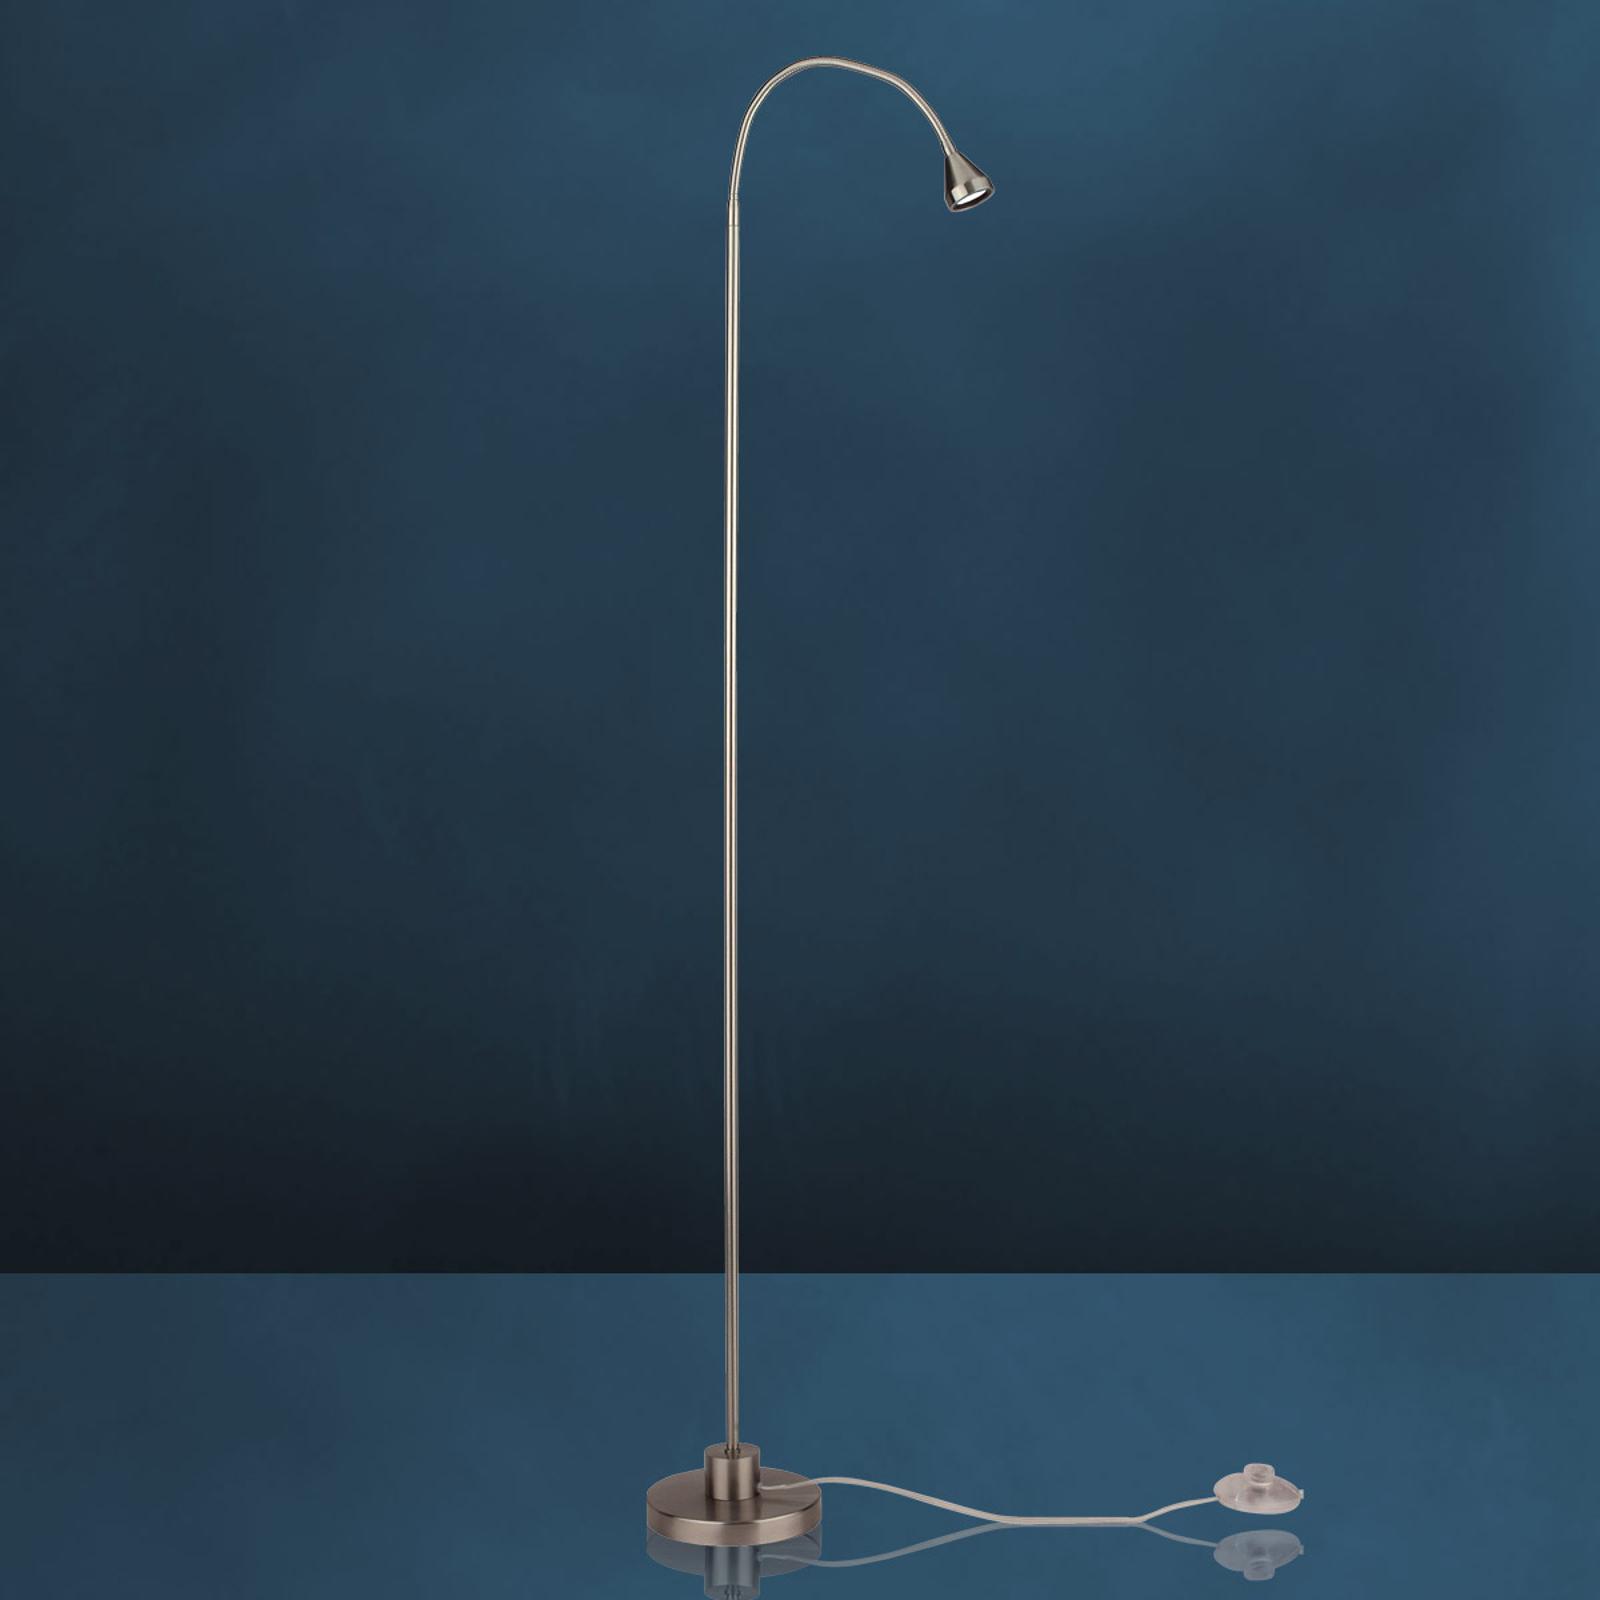 Moderni LED-lattiavalo MINI, perusvalkoinen